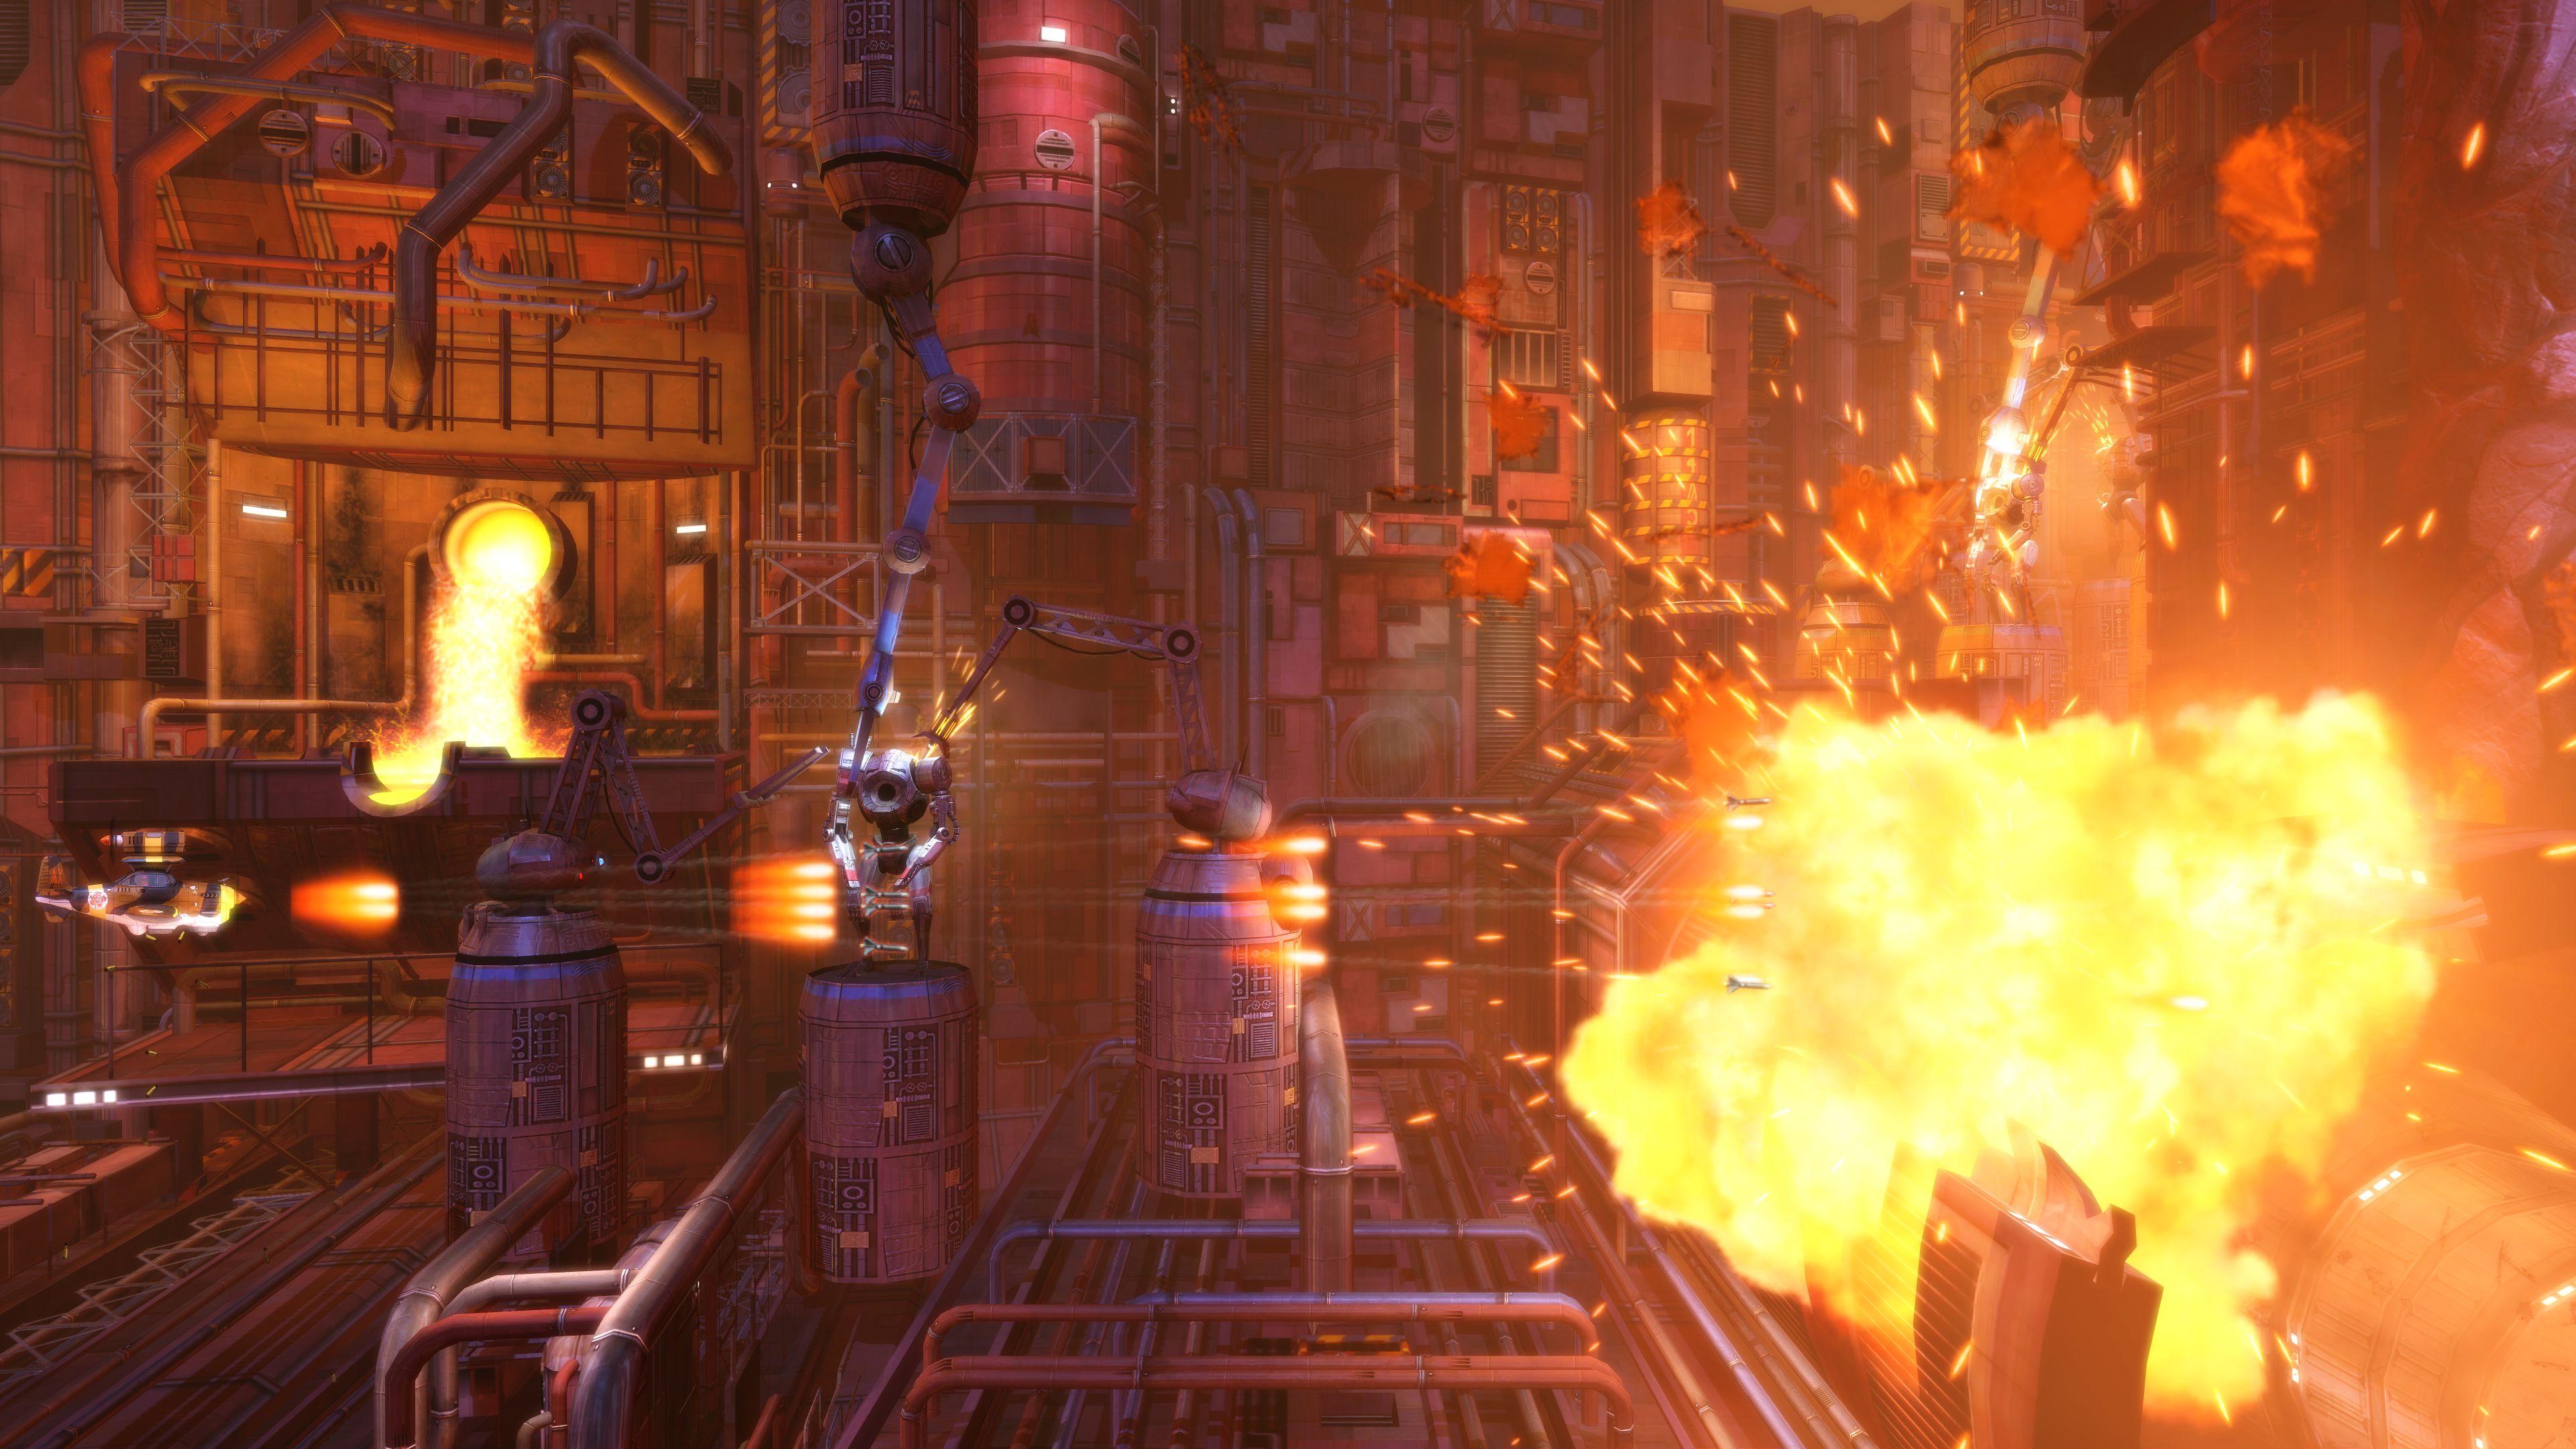 Hry pro Switch se rozrostou o Battle Chasers: Nightwar a Sine Mora EX 142164